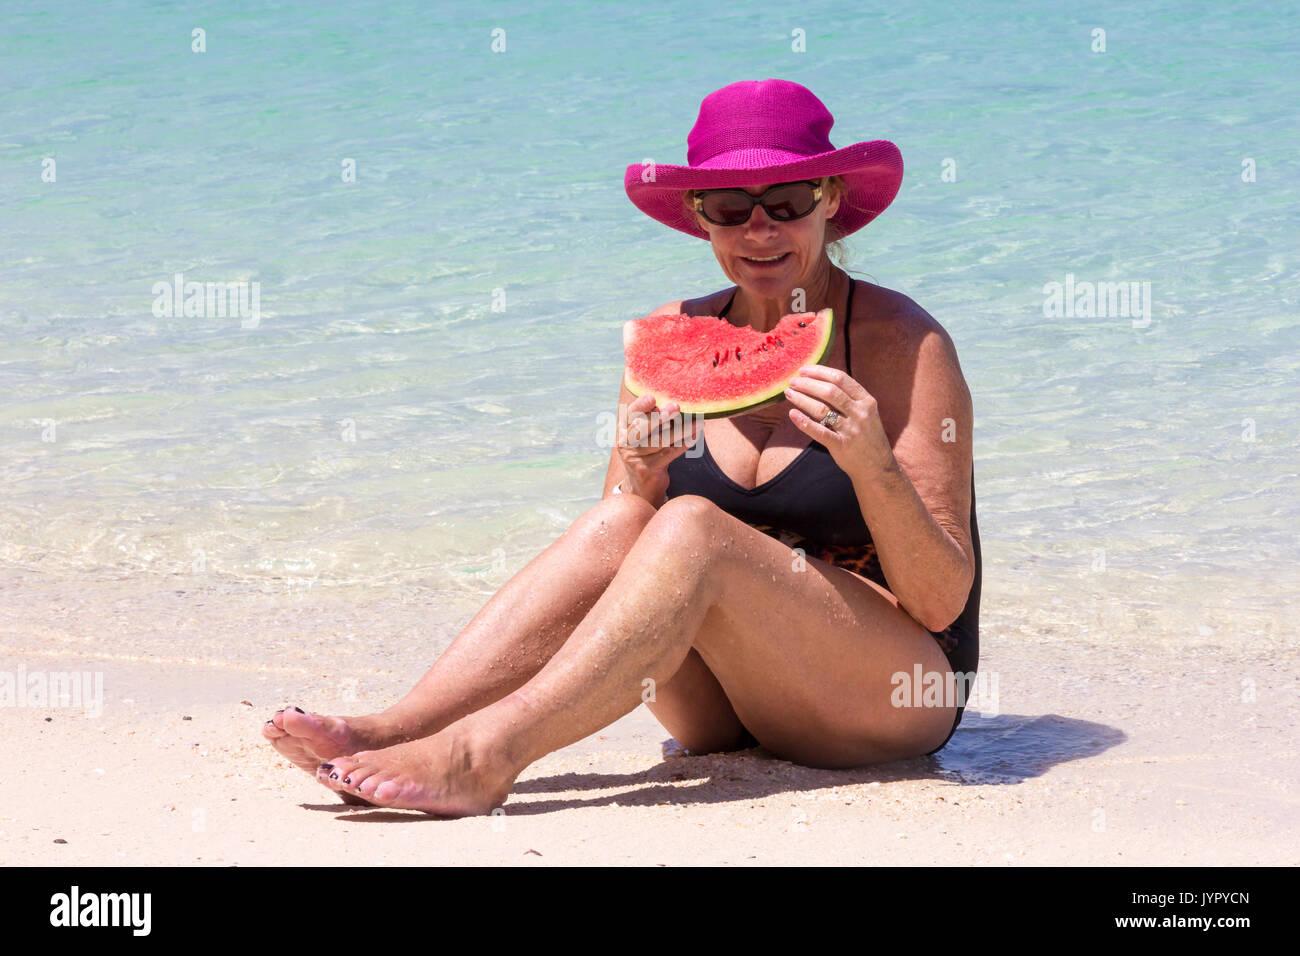 Ältere Frau mit rosa Hut mit Wassermelone im Meer sitzen, Koh Lao Liang, Trang, Thailand Stockfoto